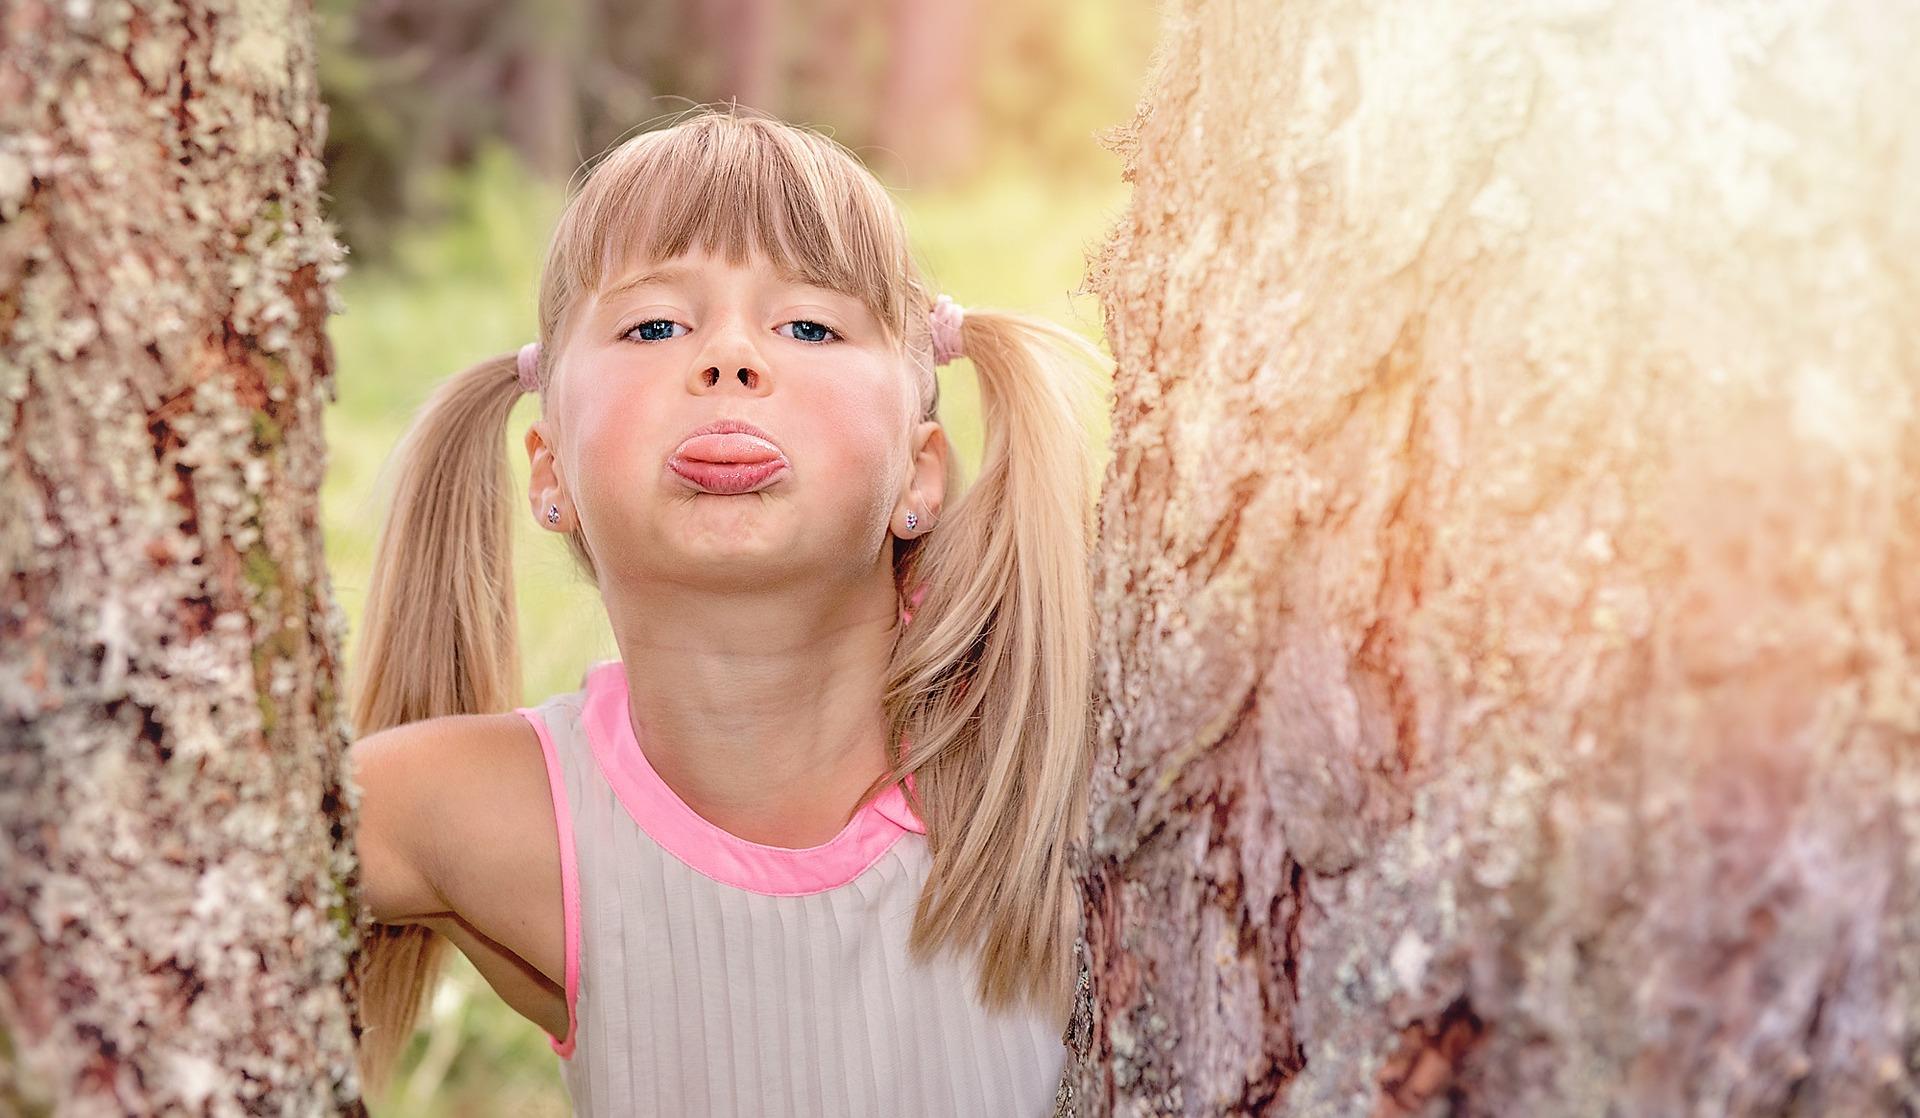 10. Zungenbakterien entfernen